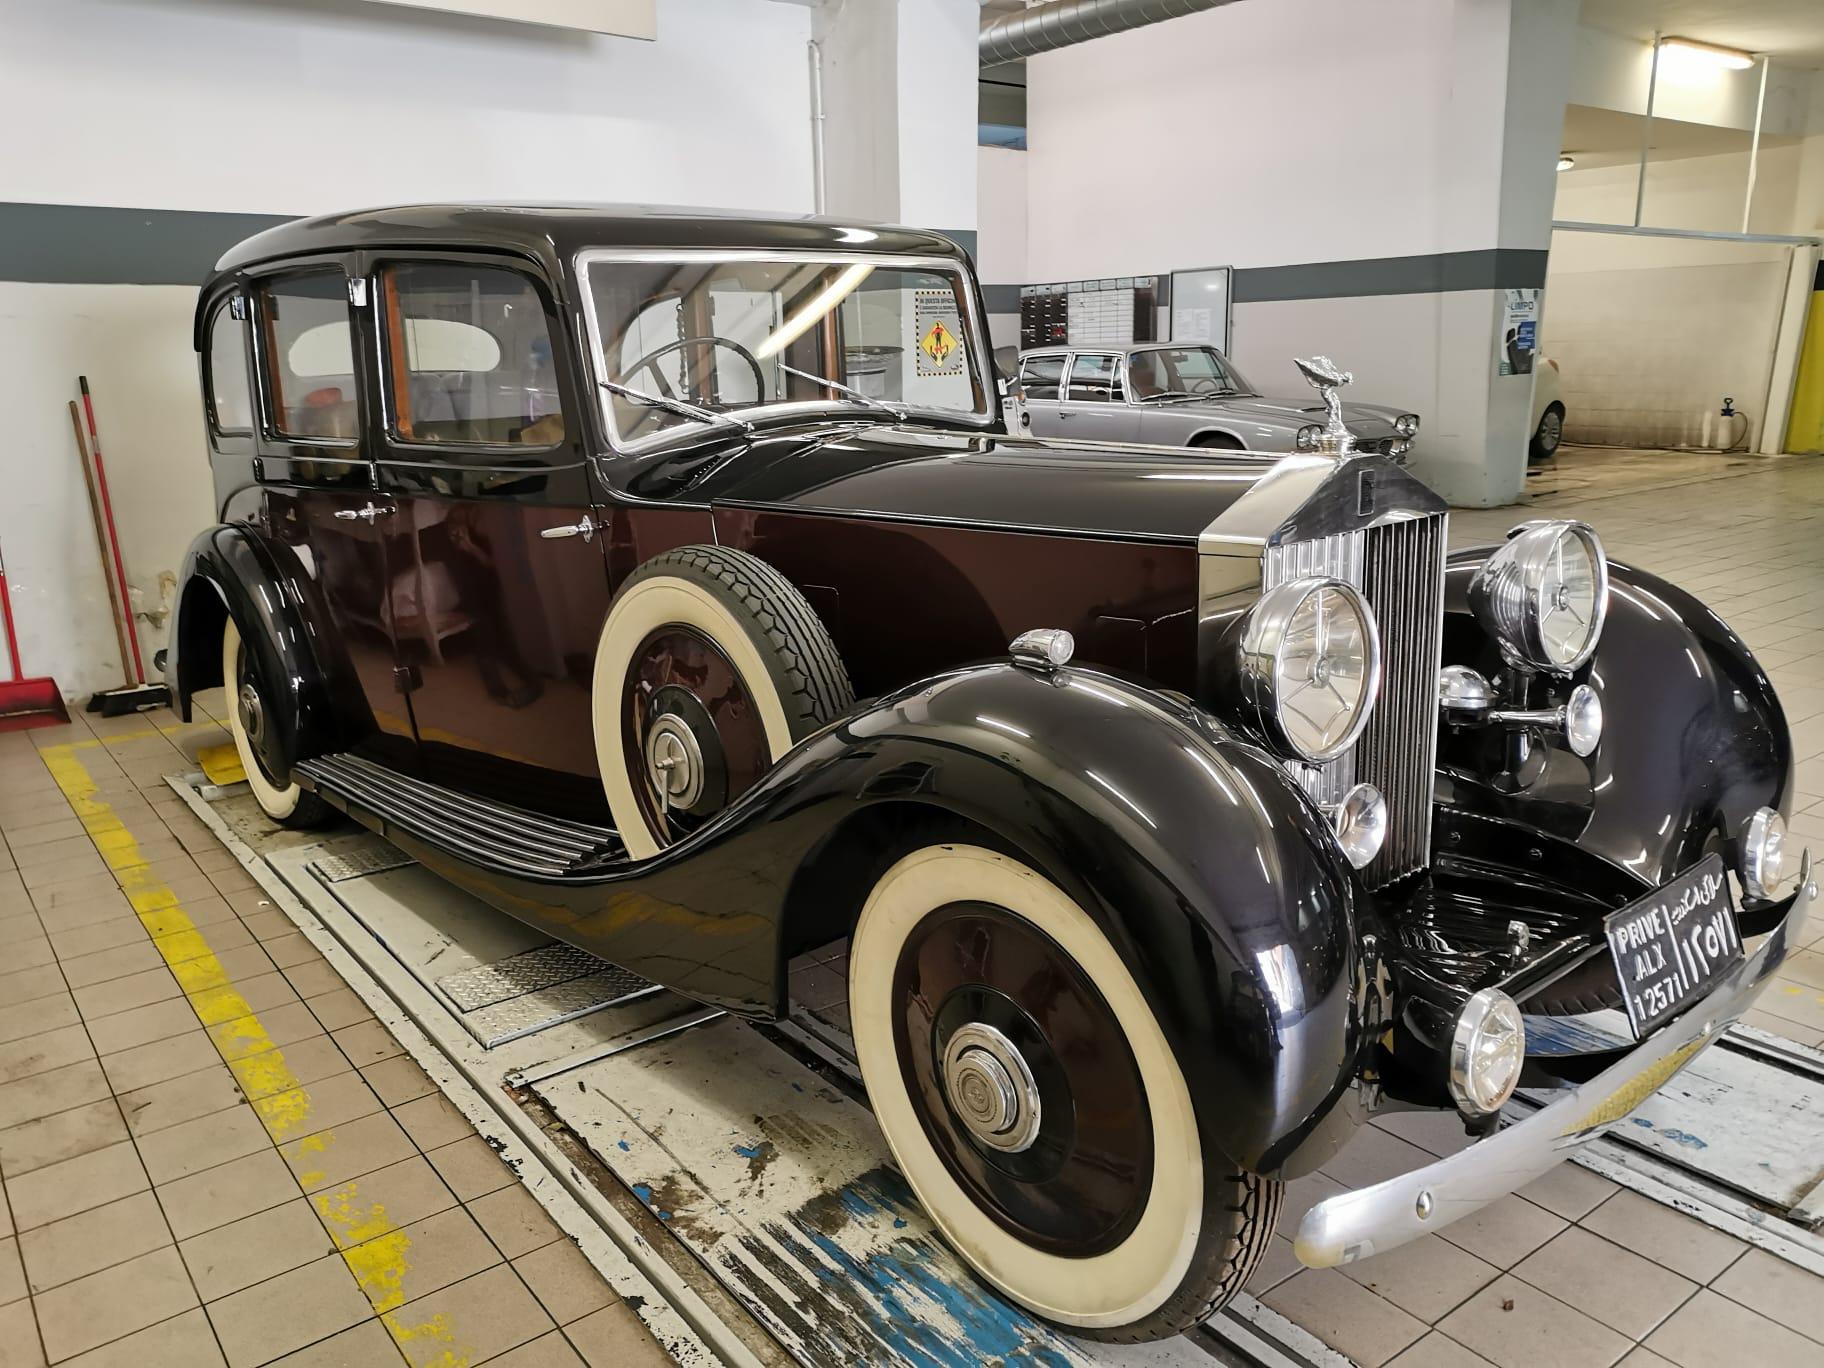 Rolls Royce Phantom del 1935 - matrimoni roma - noleggio auto matrimoni - auto d'epoca per eventi e matrimoni - nozze auto d'epoca - noleggio auto per matrimoni - Noleggio Auto matrimoni - nozze auto - auto matrimonio Roma